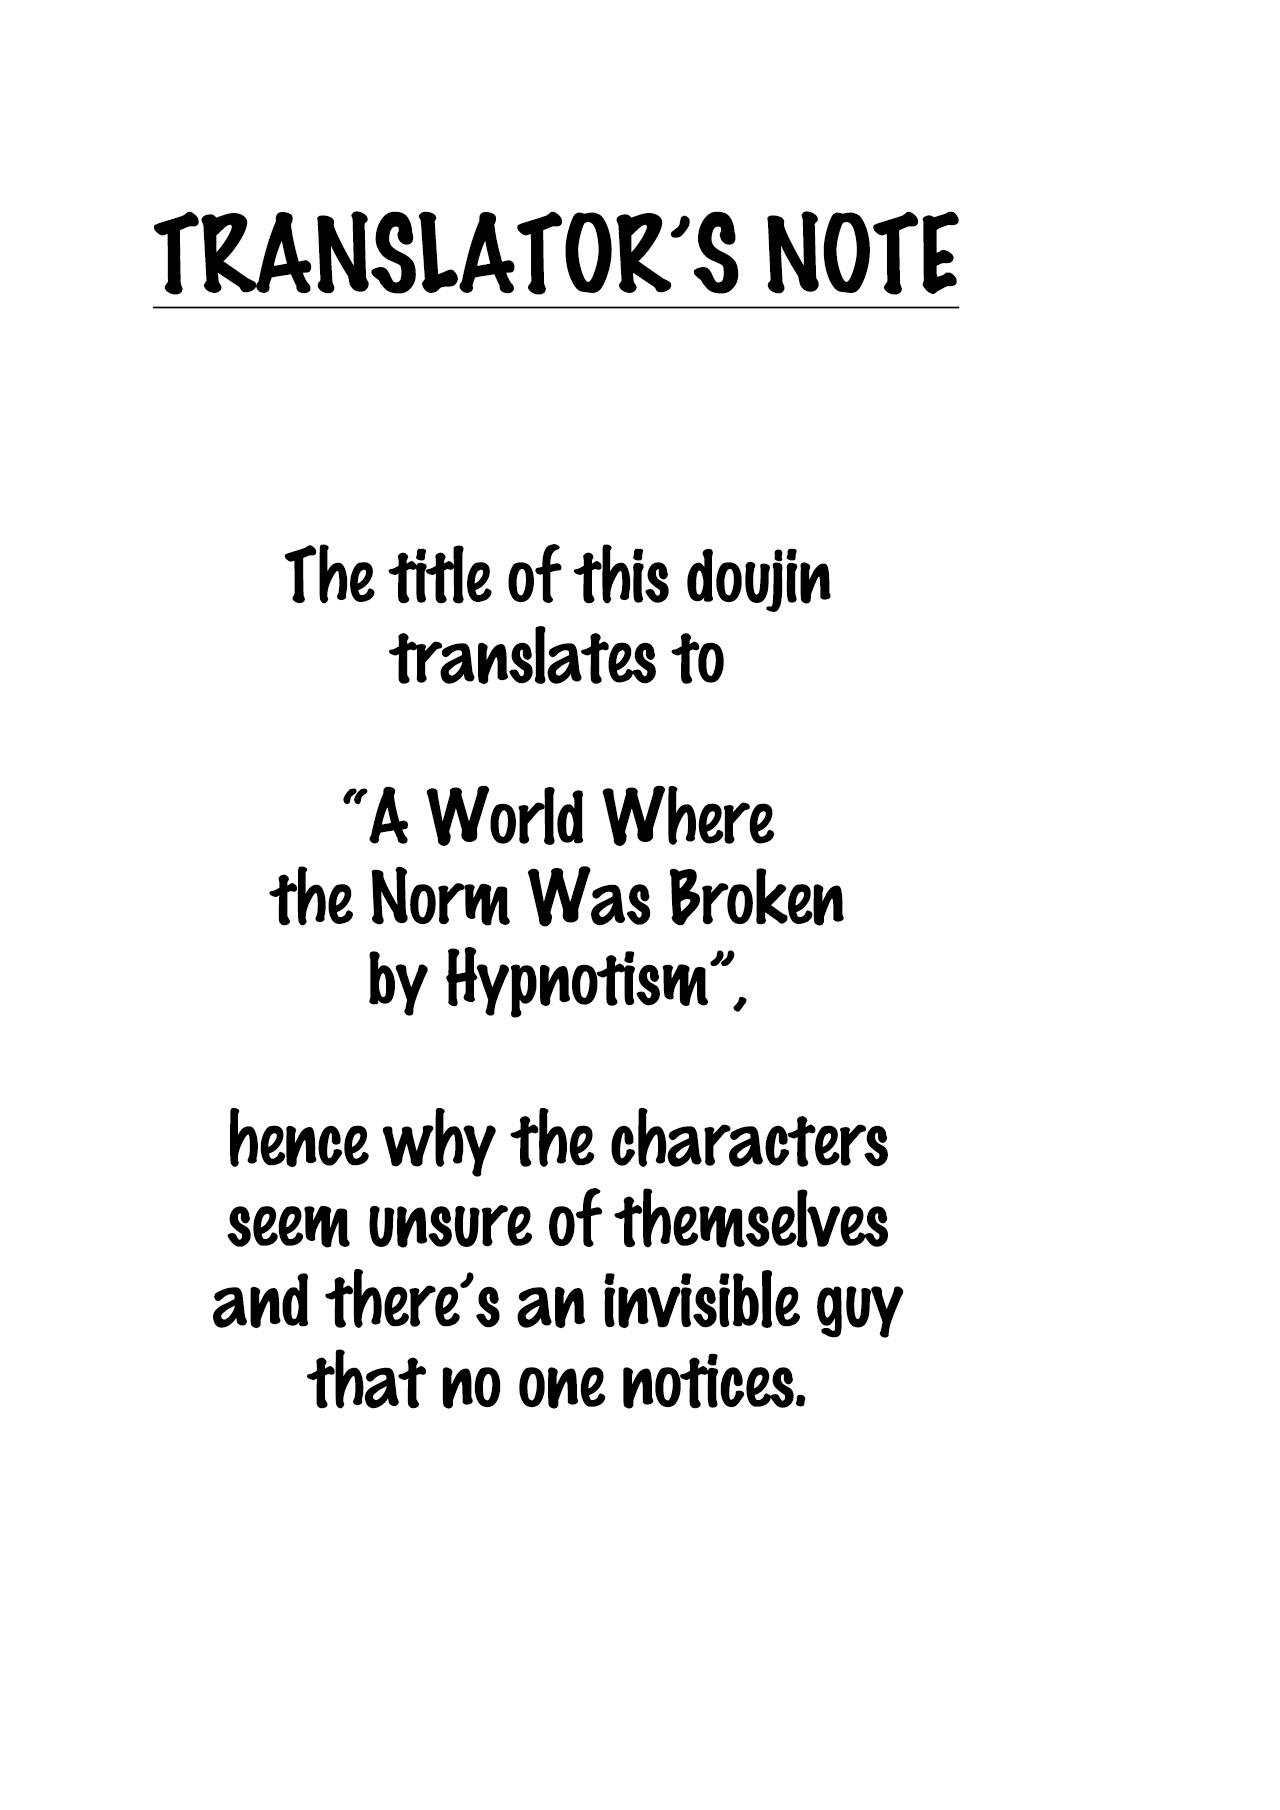 Saimin de Joushiki ga Kowasareta Sekai   A World Where the Norm is Broken by Hypnotism 1